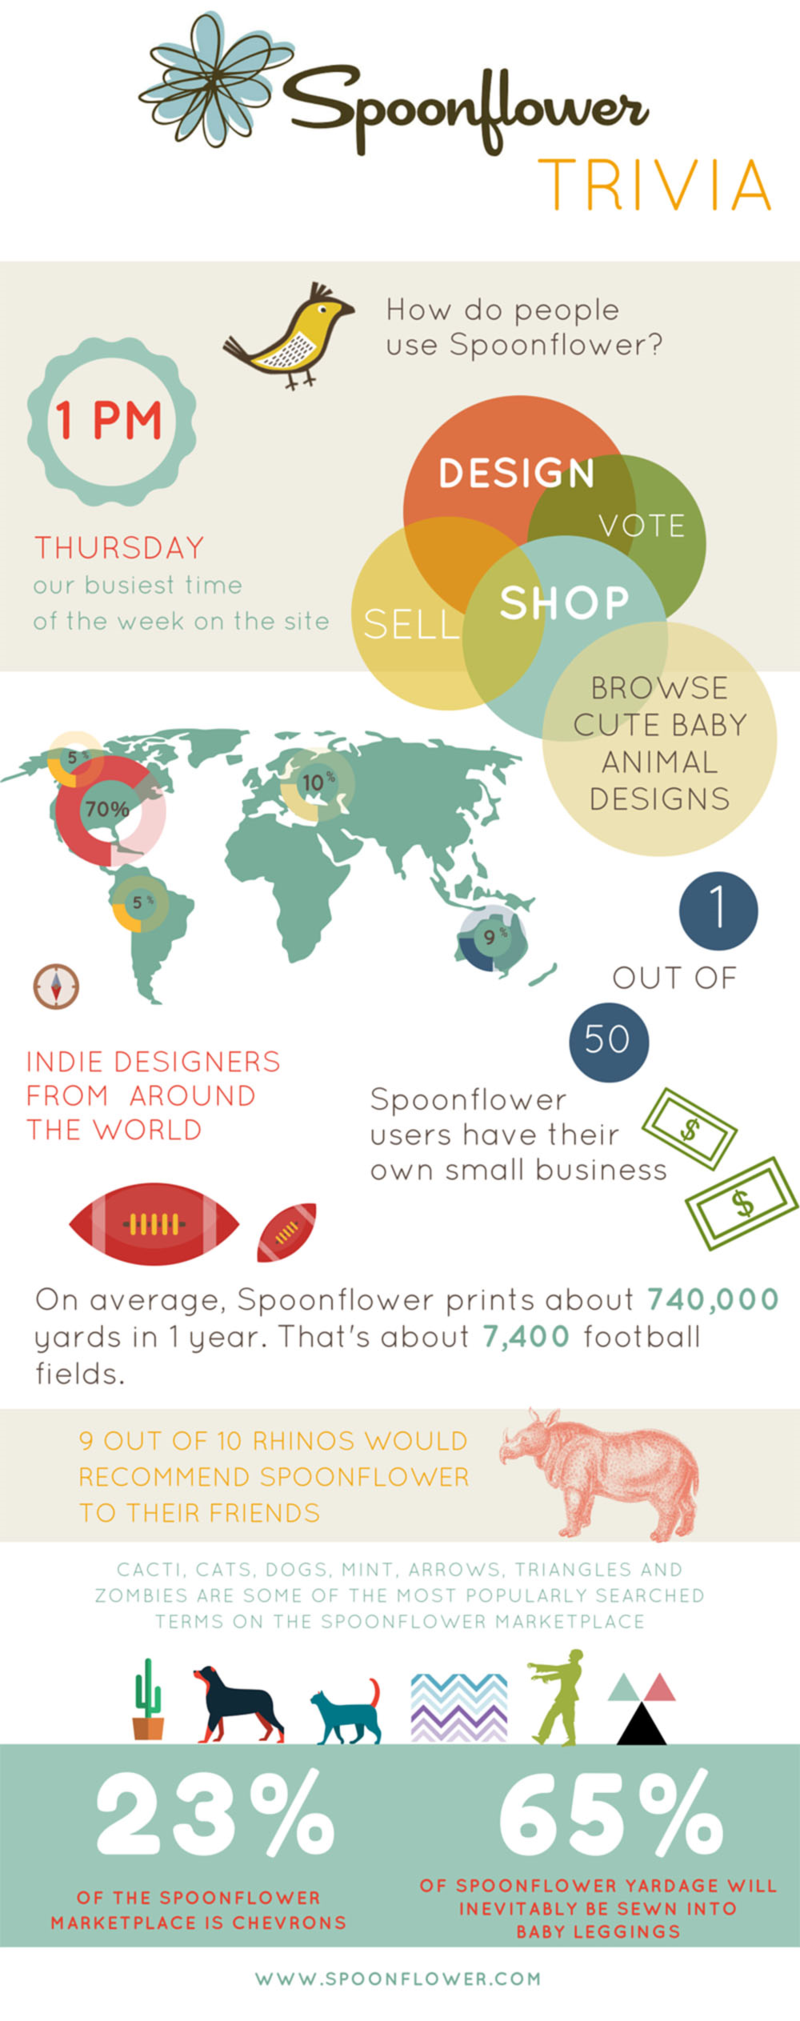 Spoonflower Trivia!